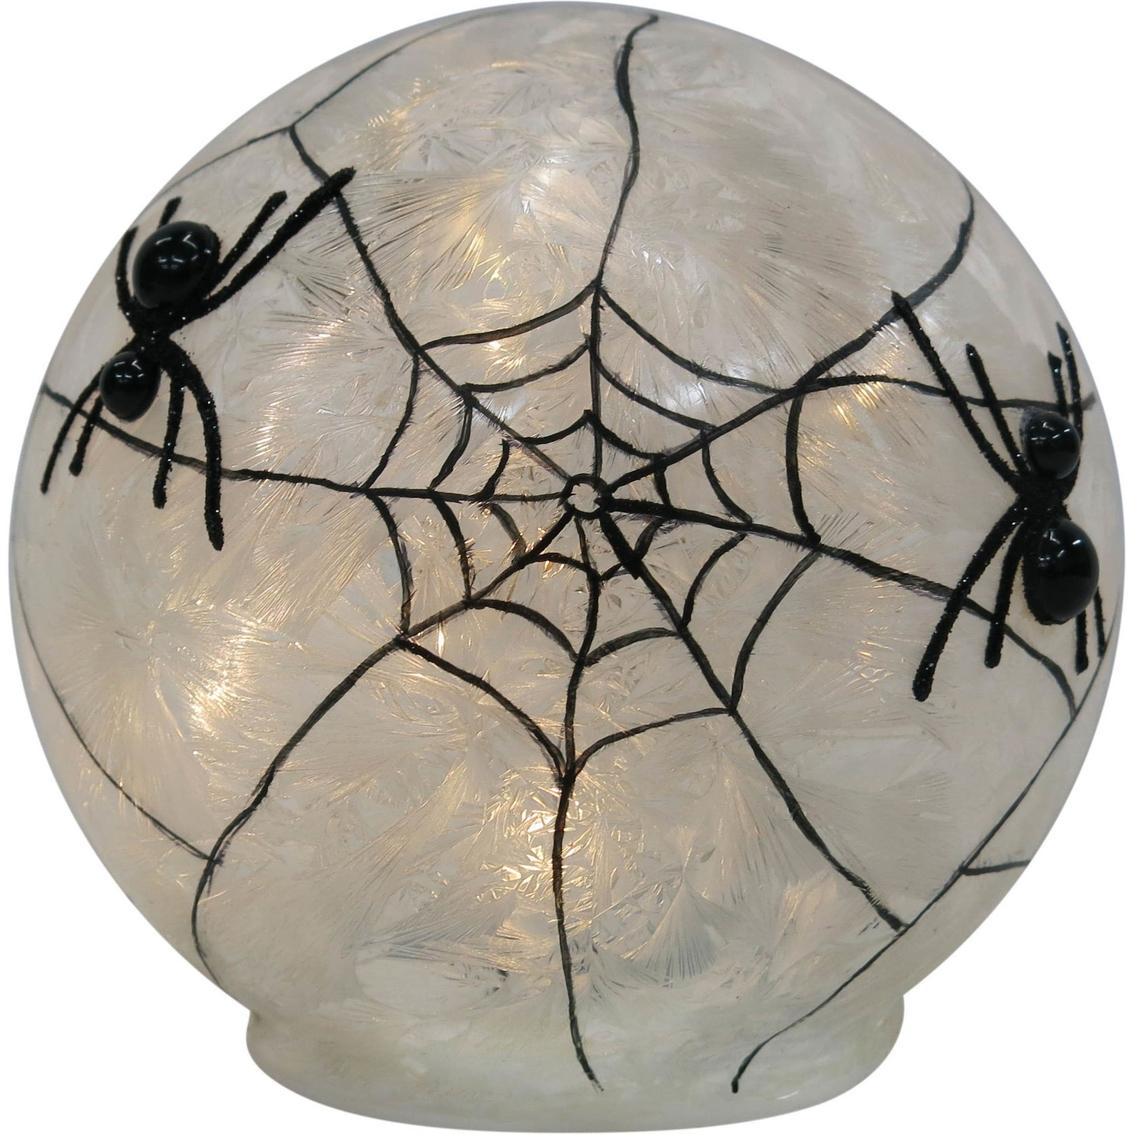 Ice Design Factory Led Lighted Spider Web Ball Decor